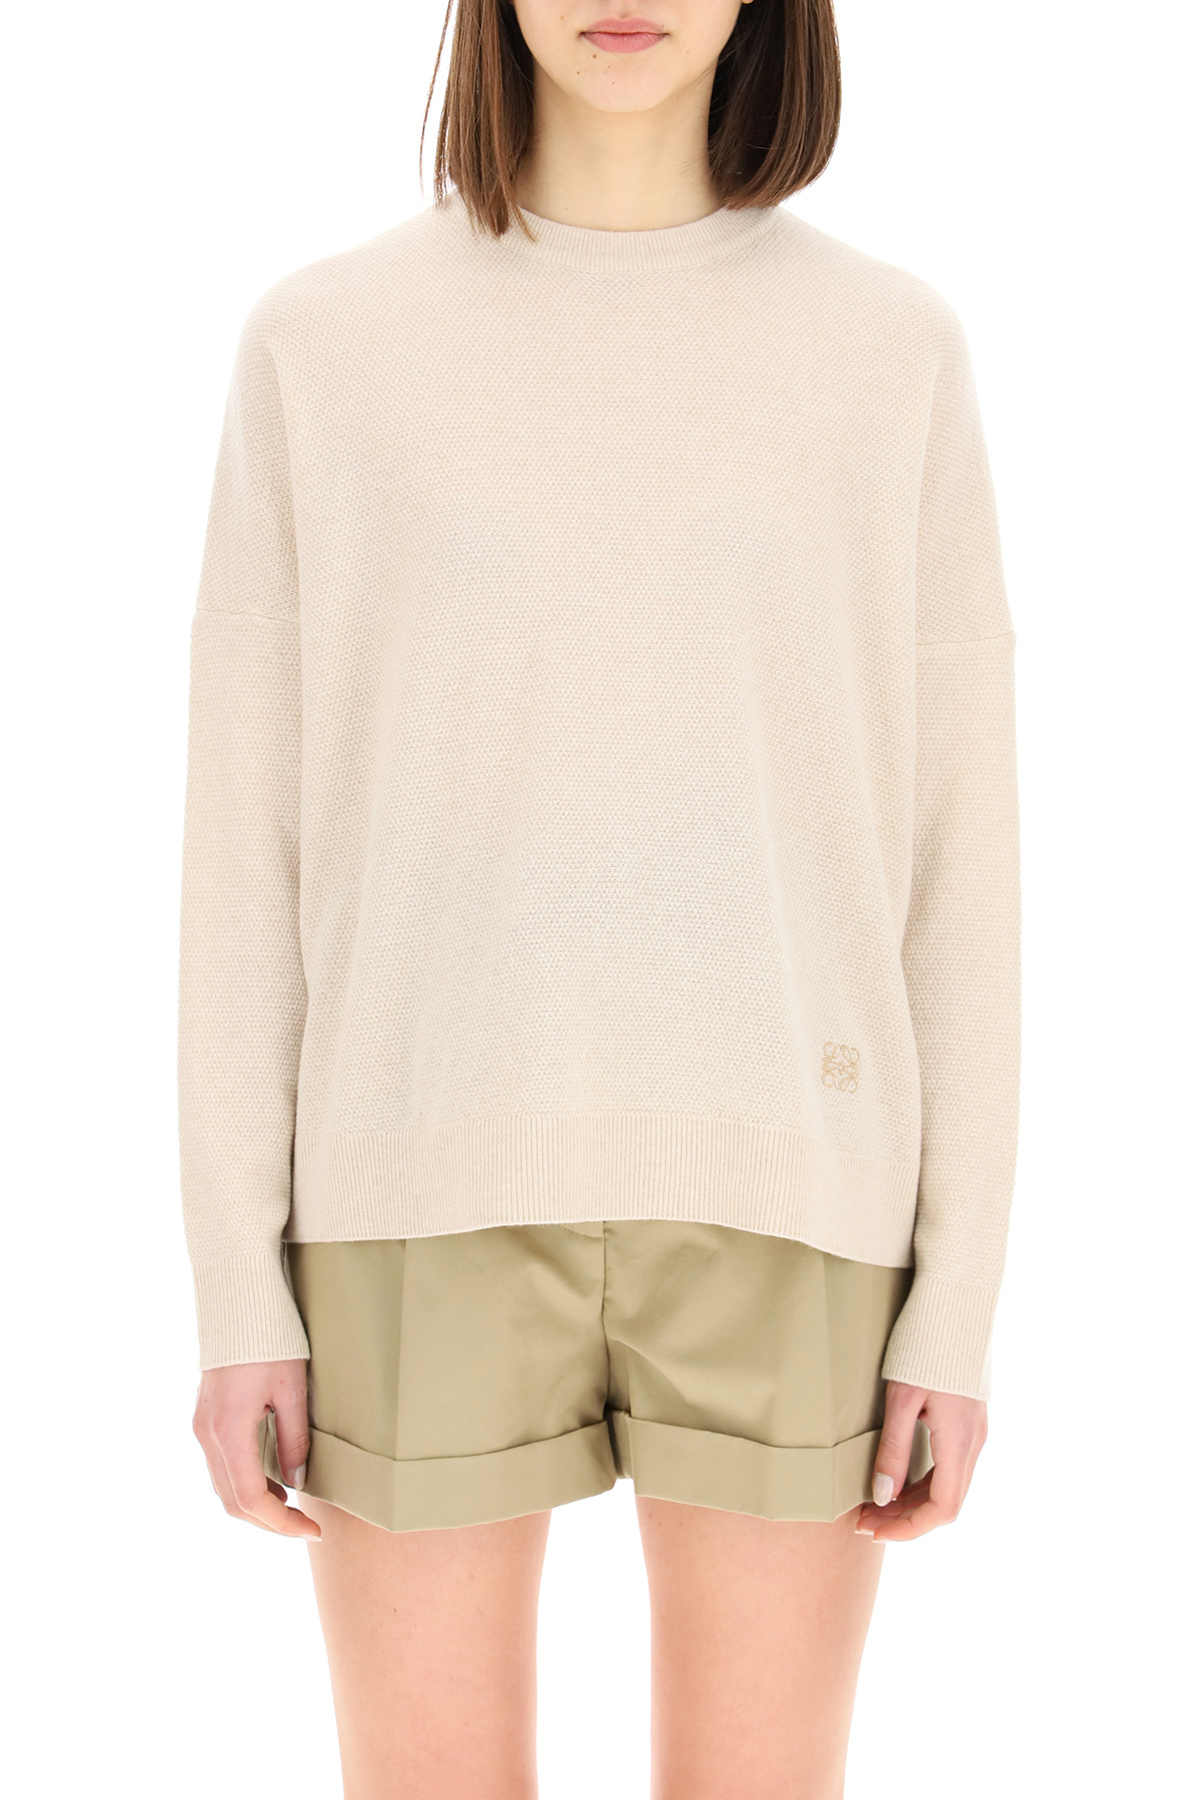 Loewe maglia over in cashmere